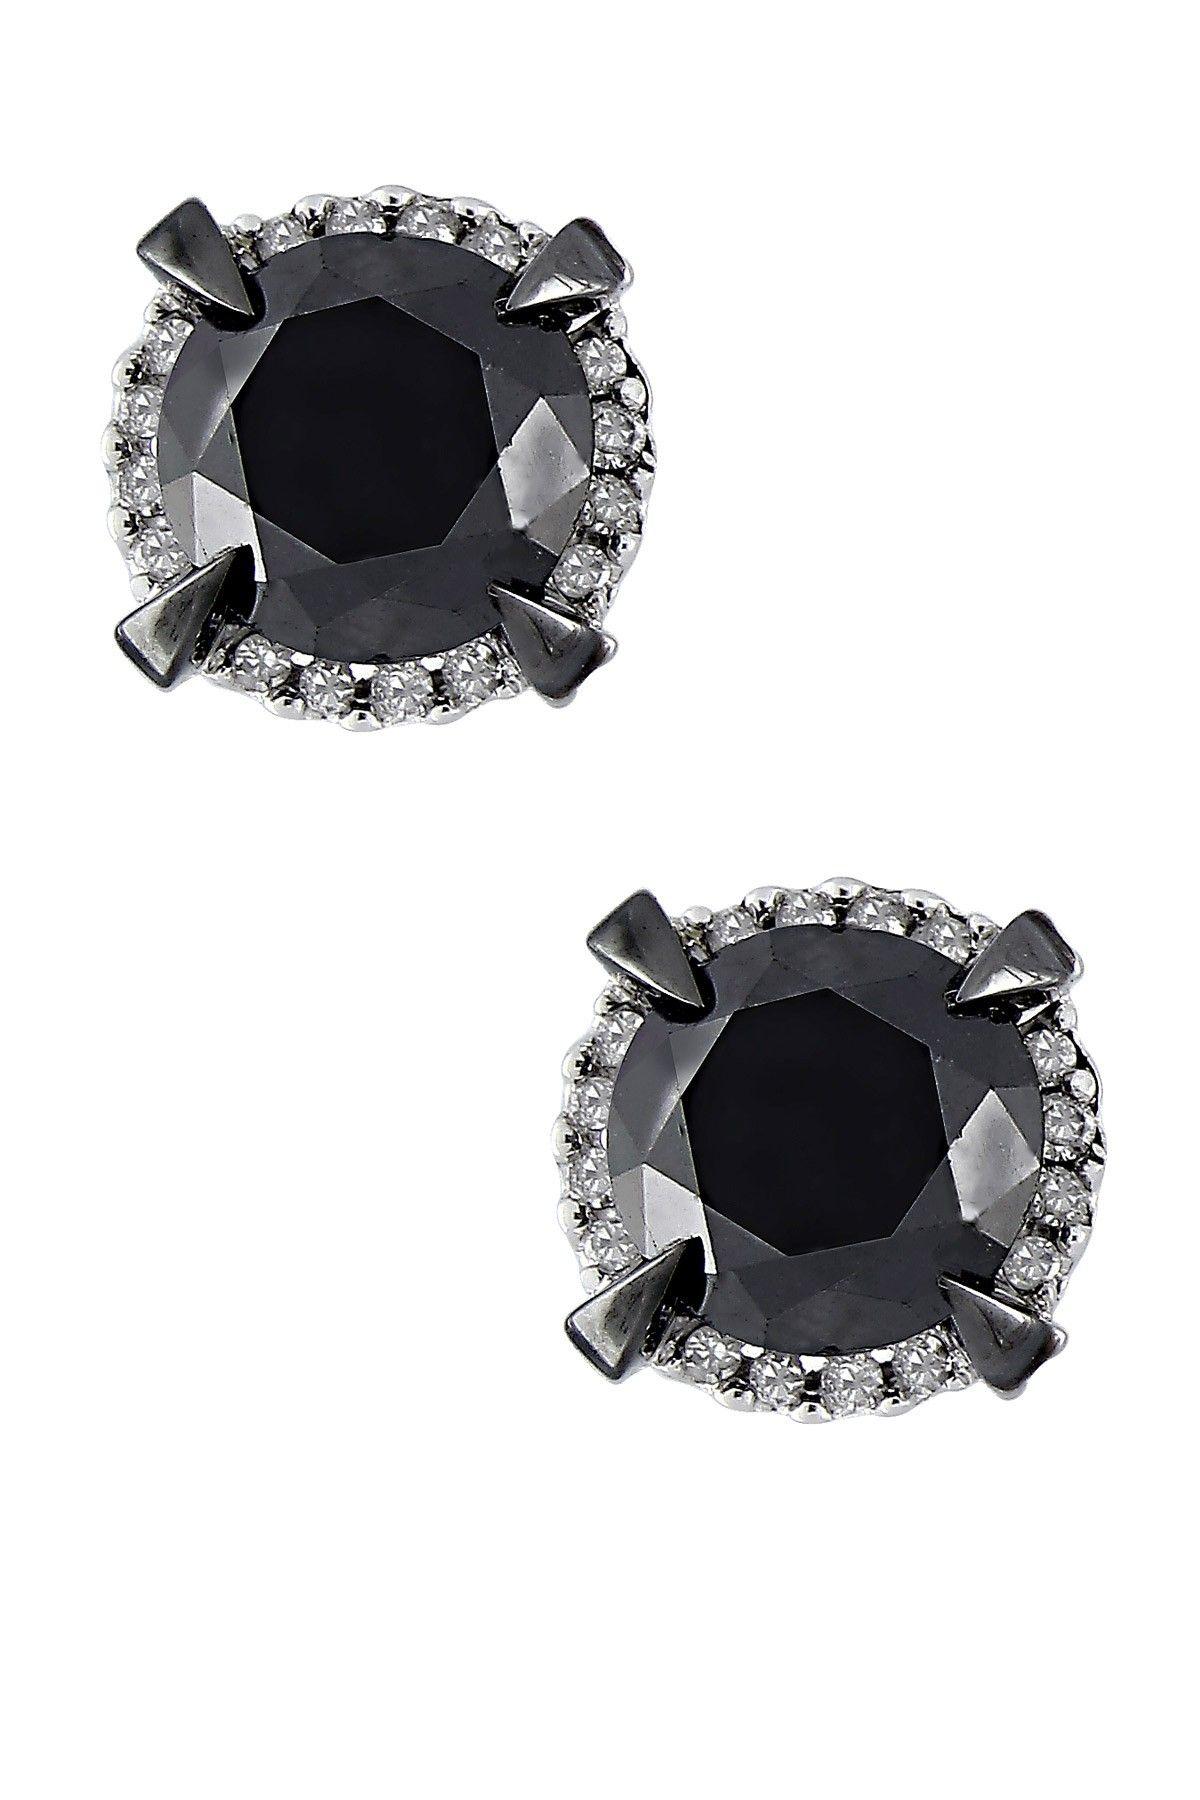 HauteLook - Two-Tonw Round Black Diamond & White Diamond Halo Stud Earrings 2.75ctw  $525